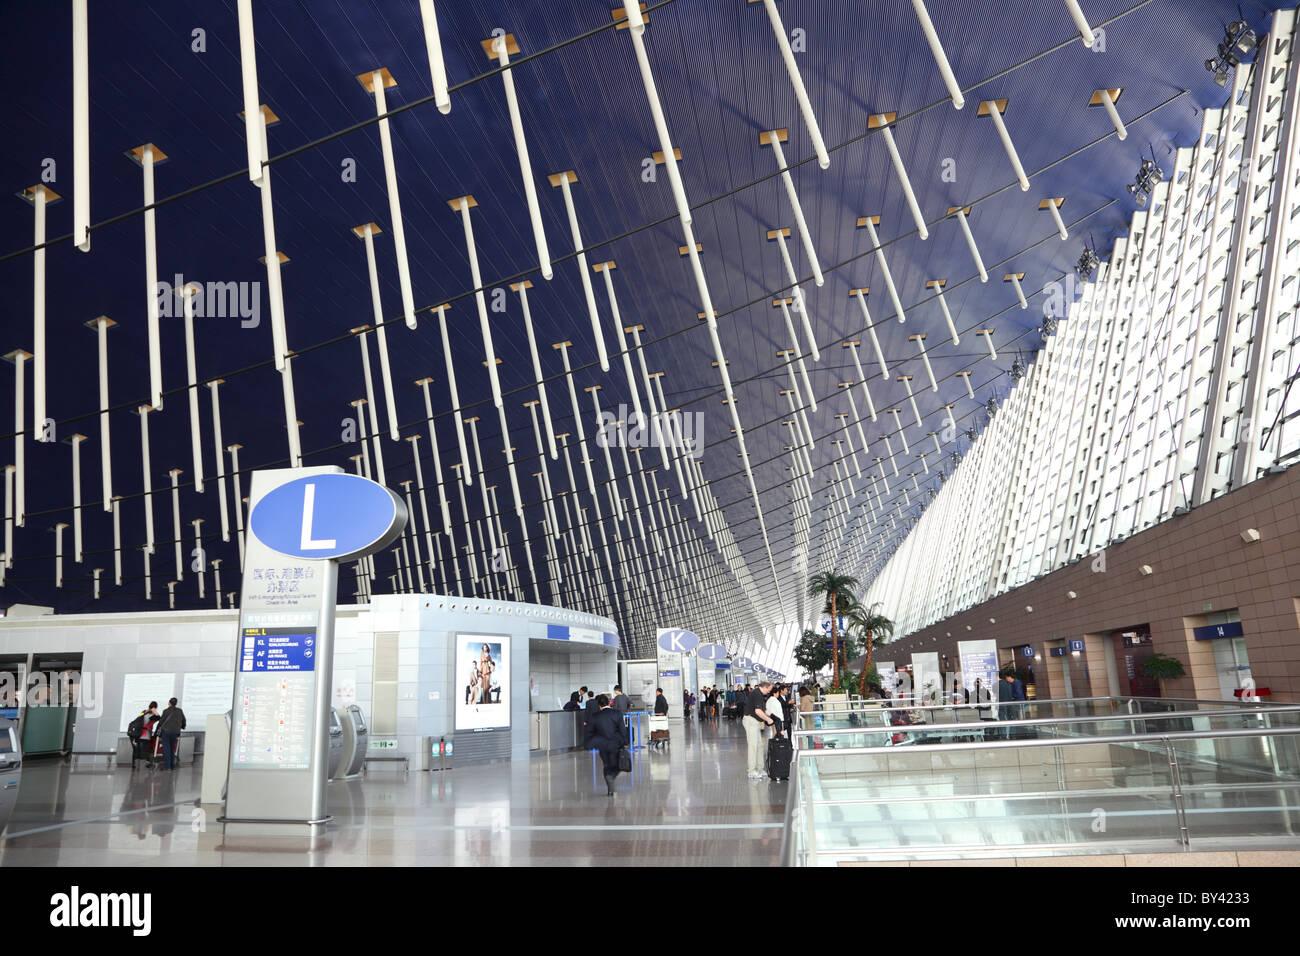 L'Aéroport International de Shanghai. Photo Stock